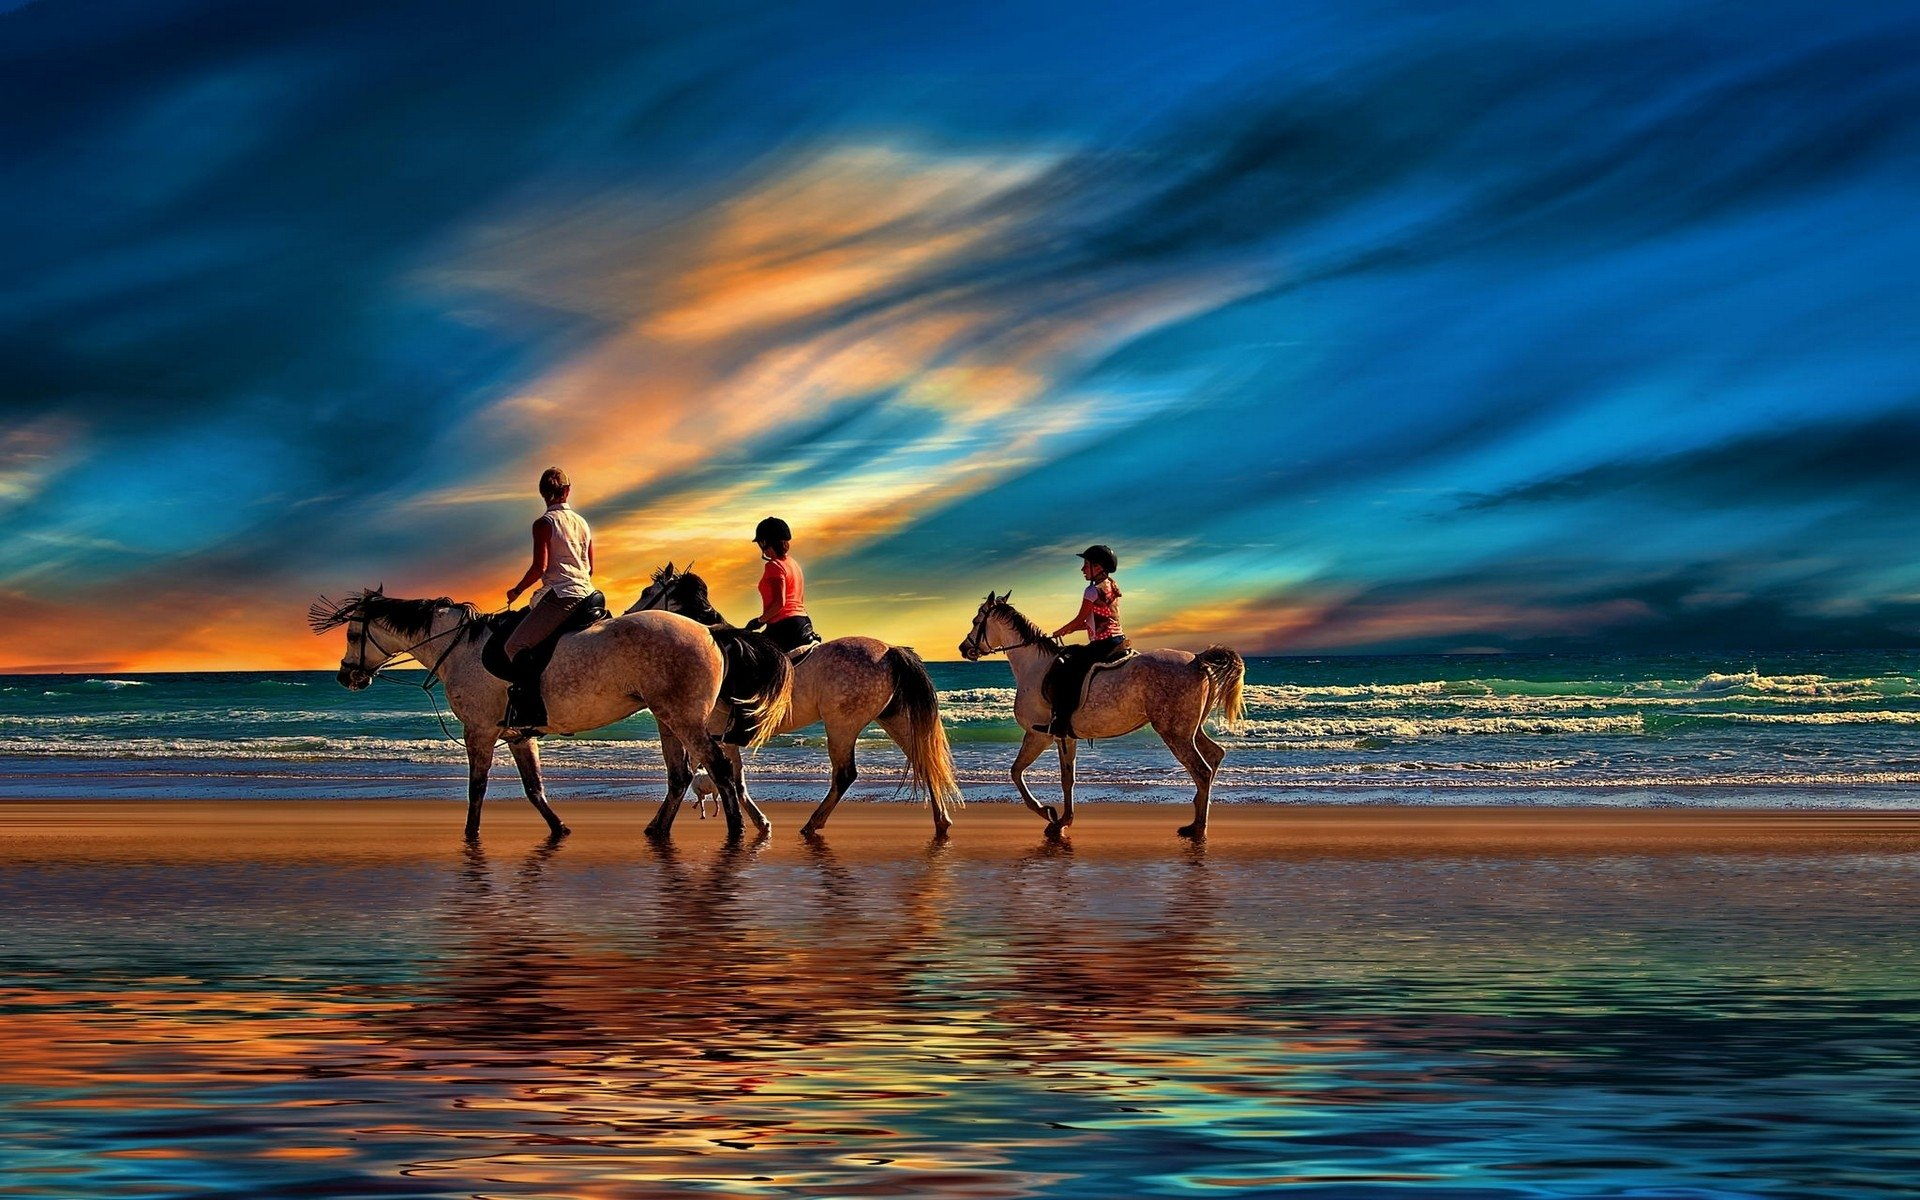 Riding on the Beach   Horseback Riding Wallpaper 42657153 1920x1200